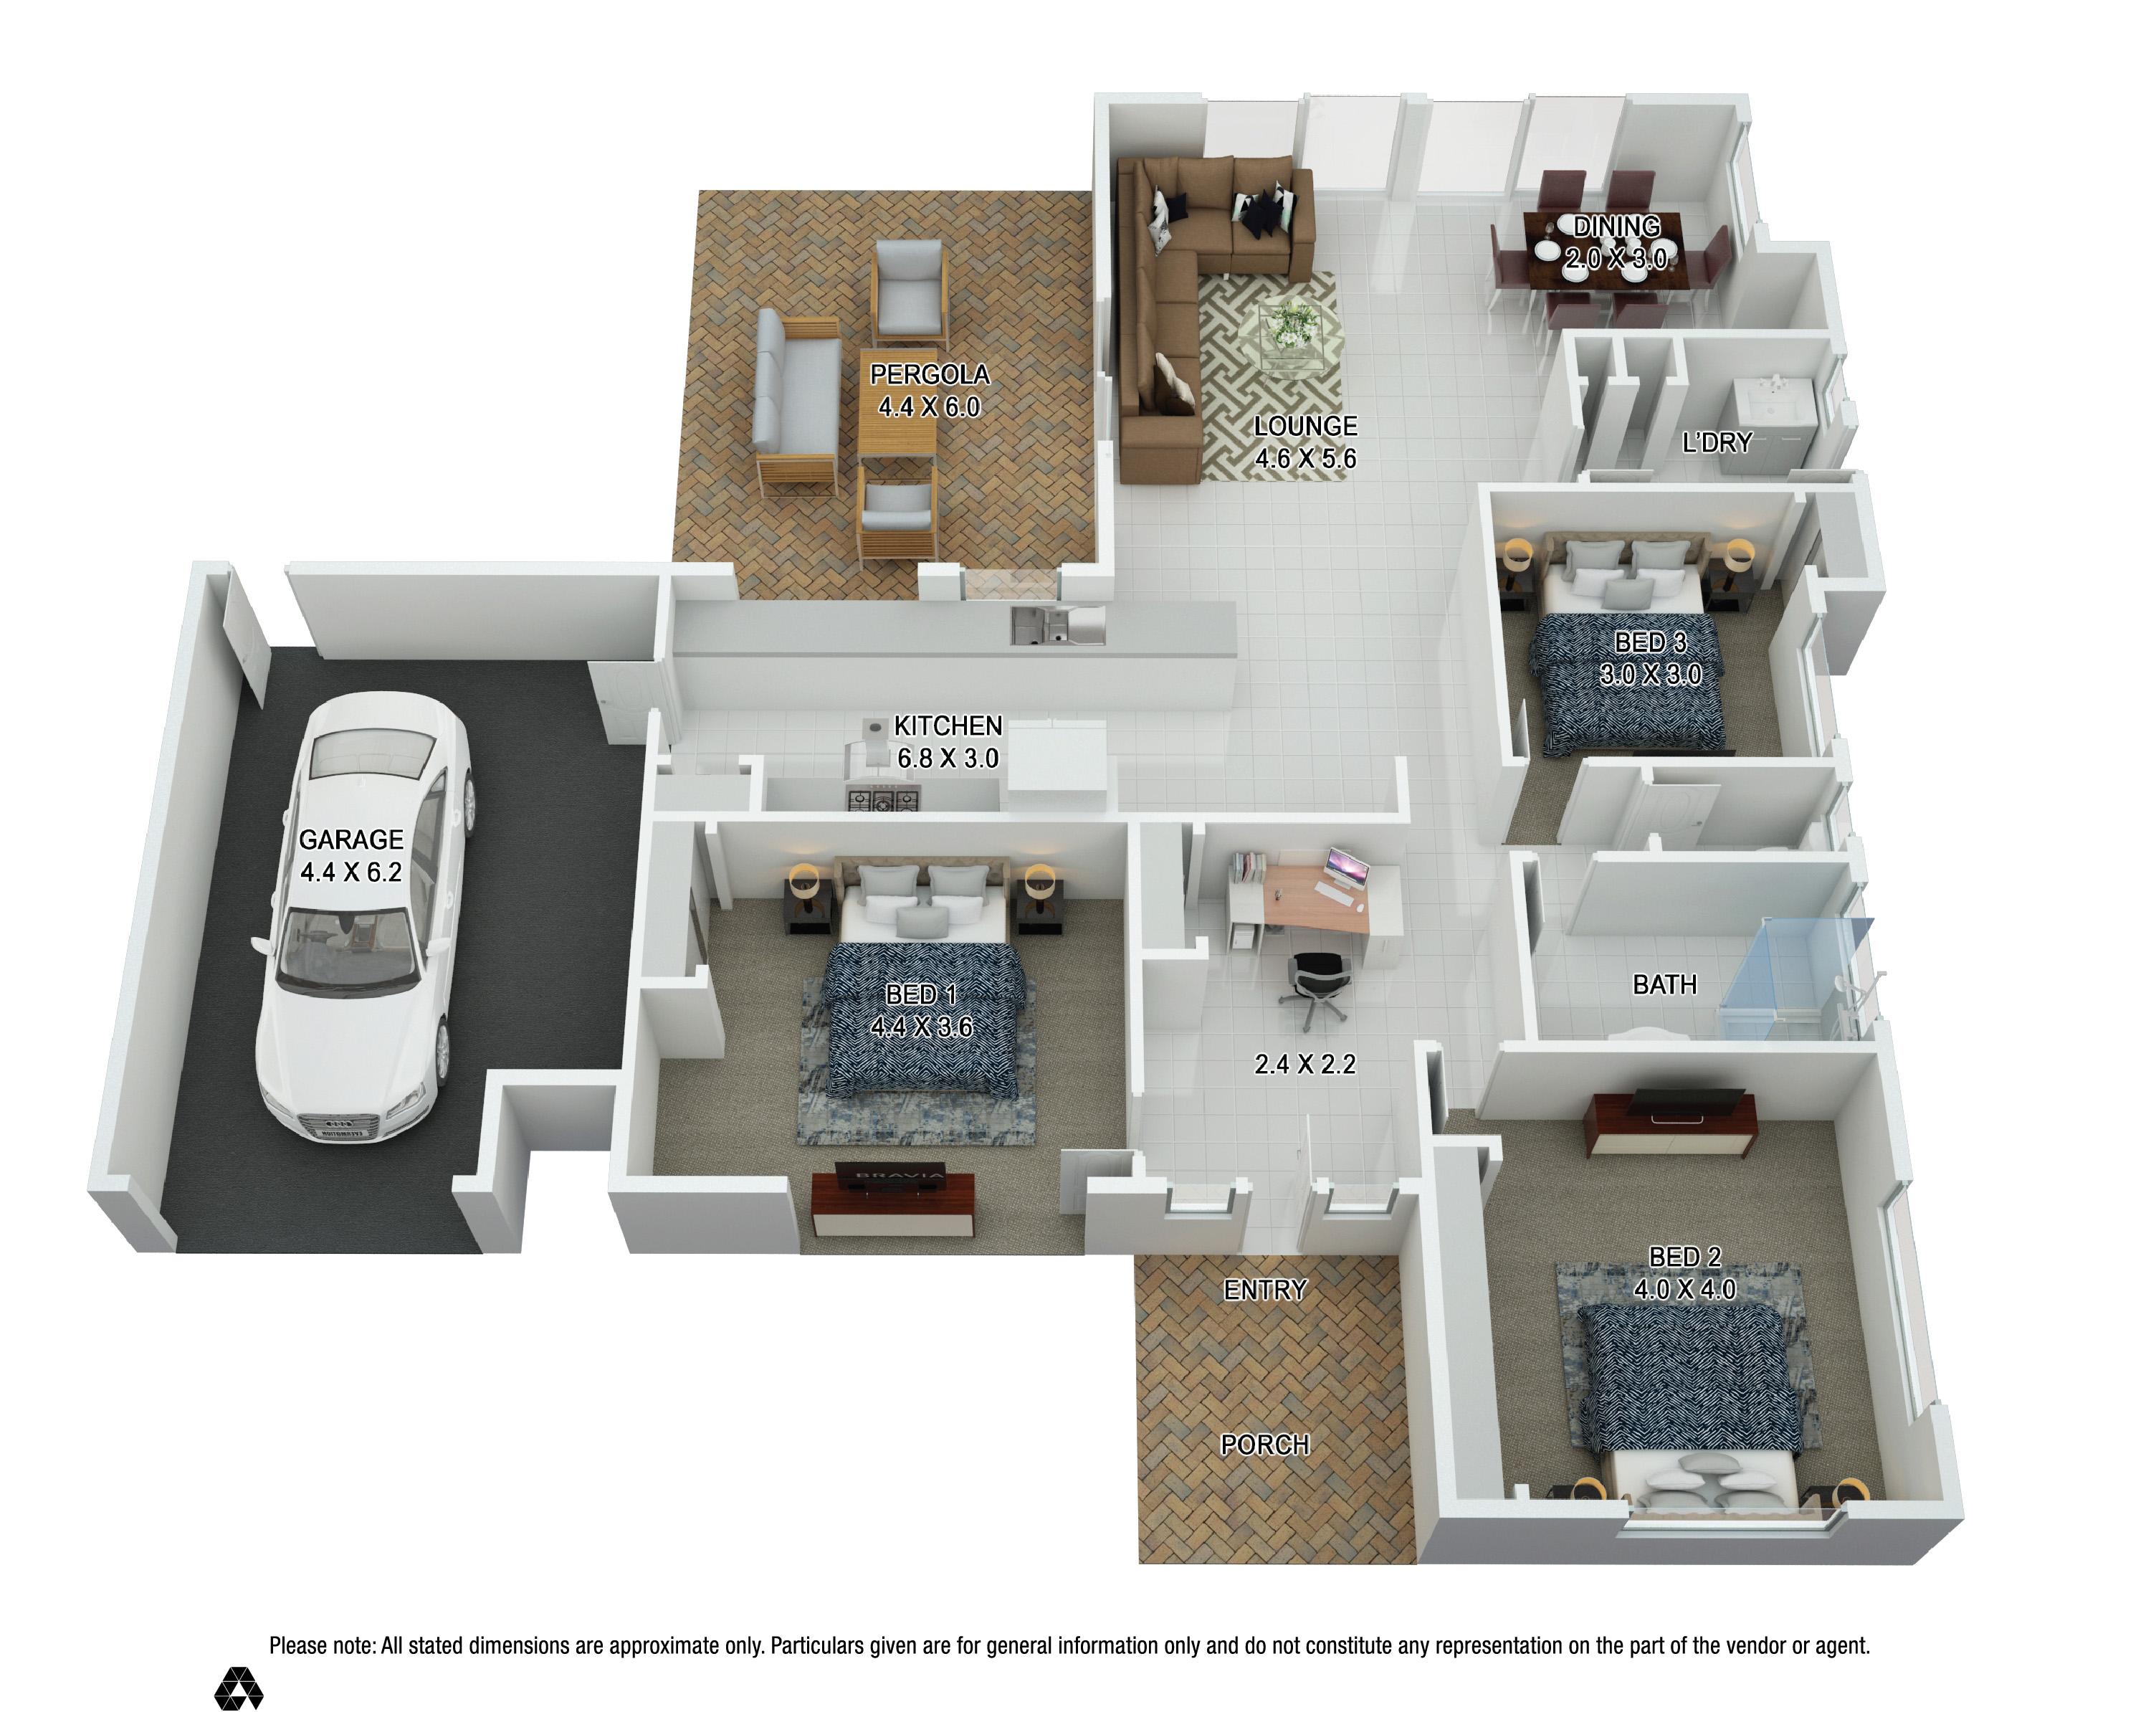 mydimport-1588591133-hires.20545-FloorPlan.jpg